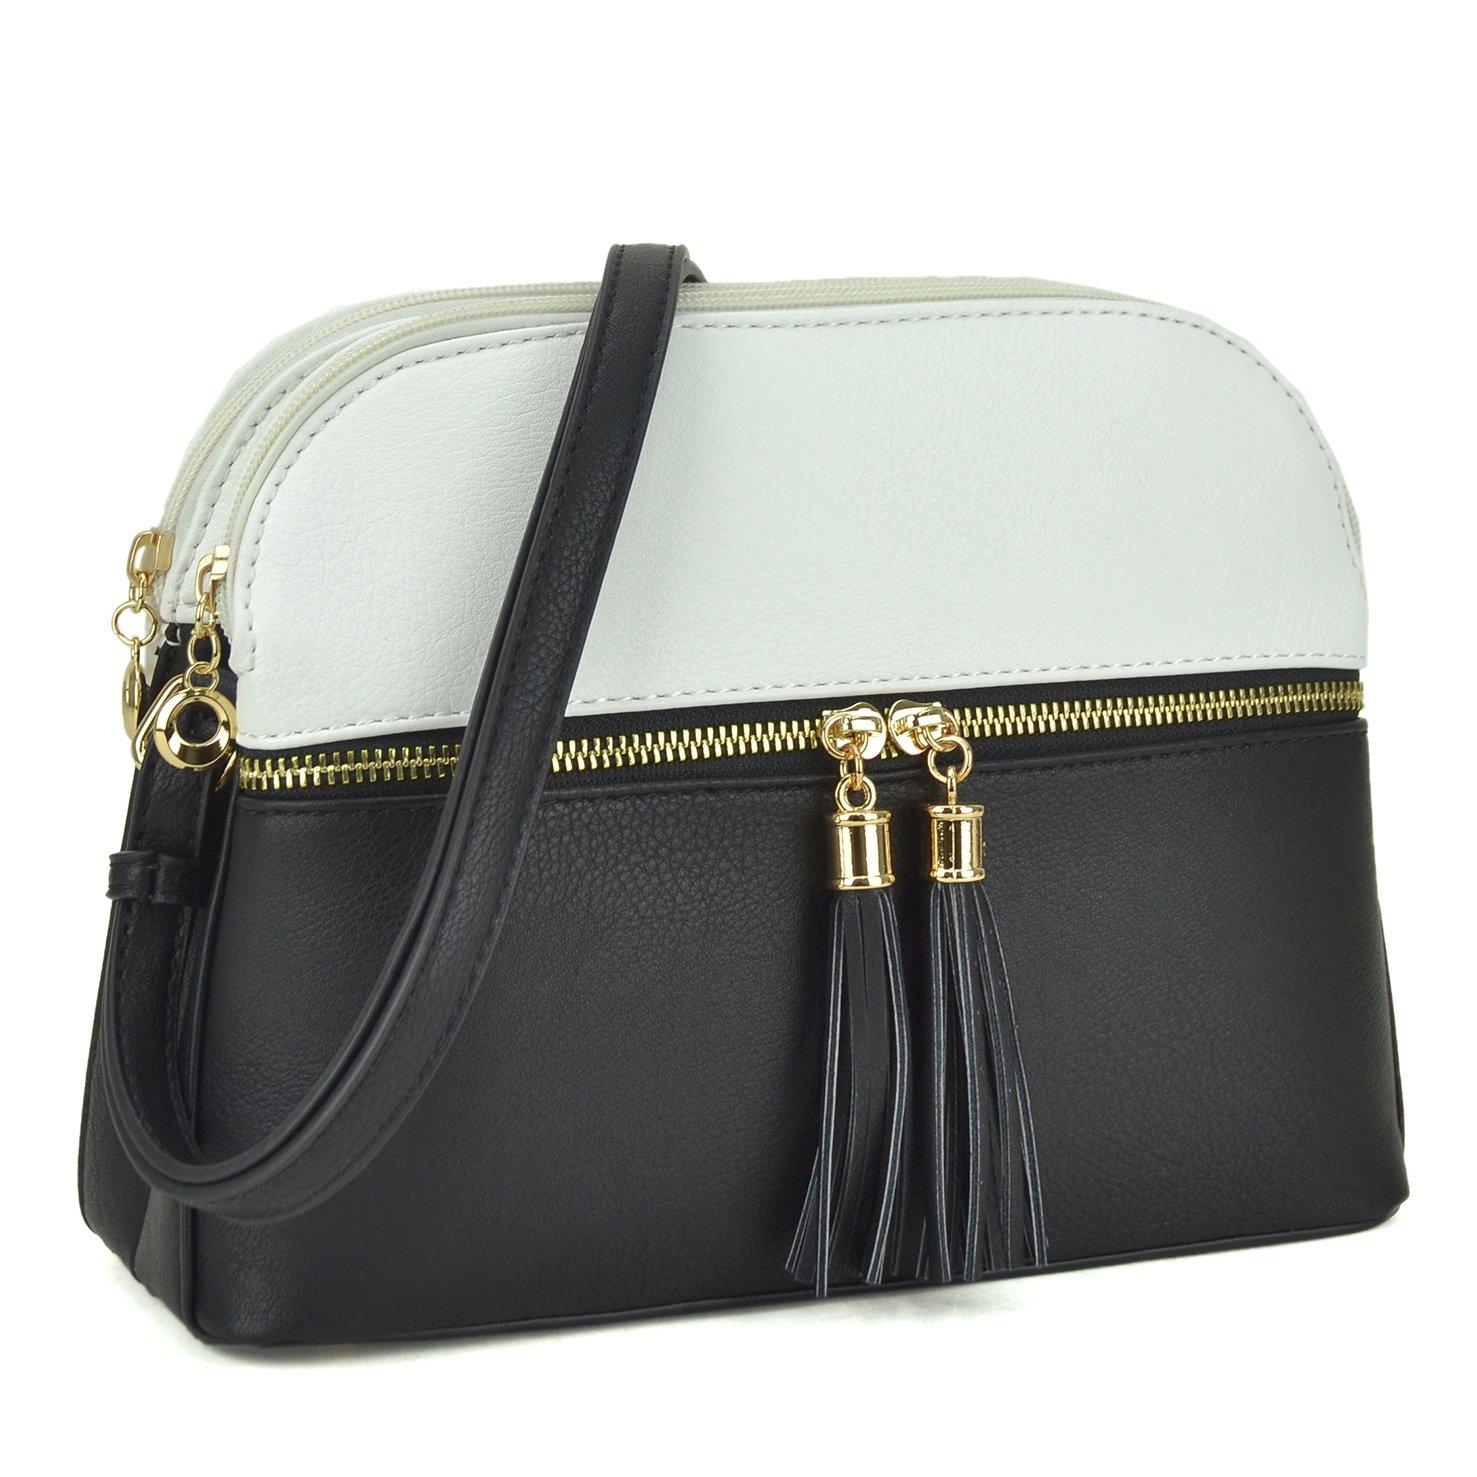 Lightweight Women Crossbody Bags,Travel Shoulder Messenger Purse Medium Size Clutch Multi Zipper Designer Satchel for All Seasons (MKP-JC-LP050-WT/BK)